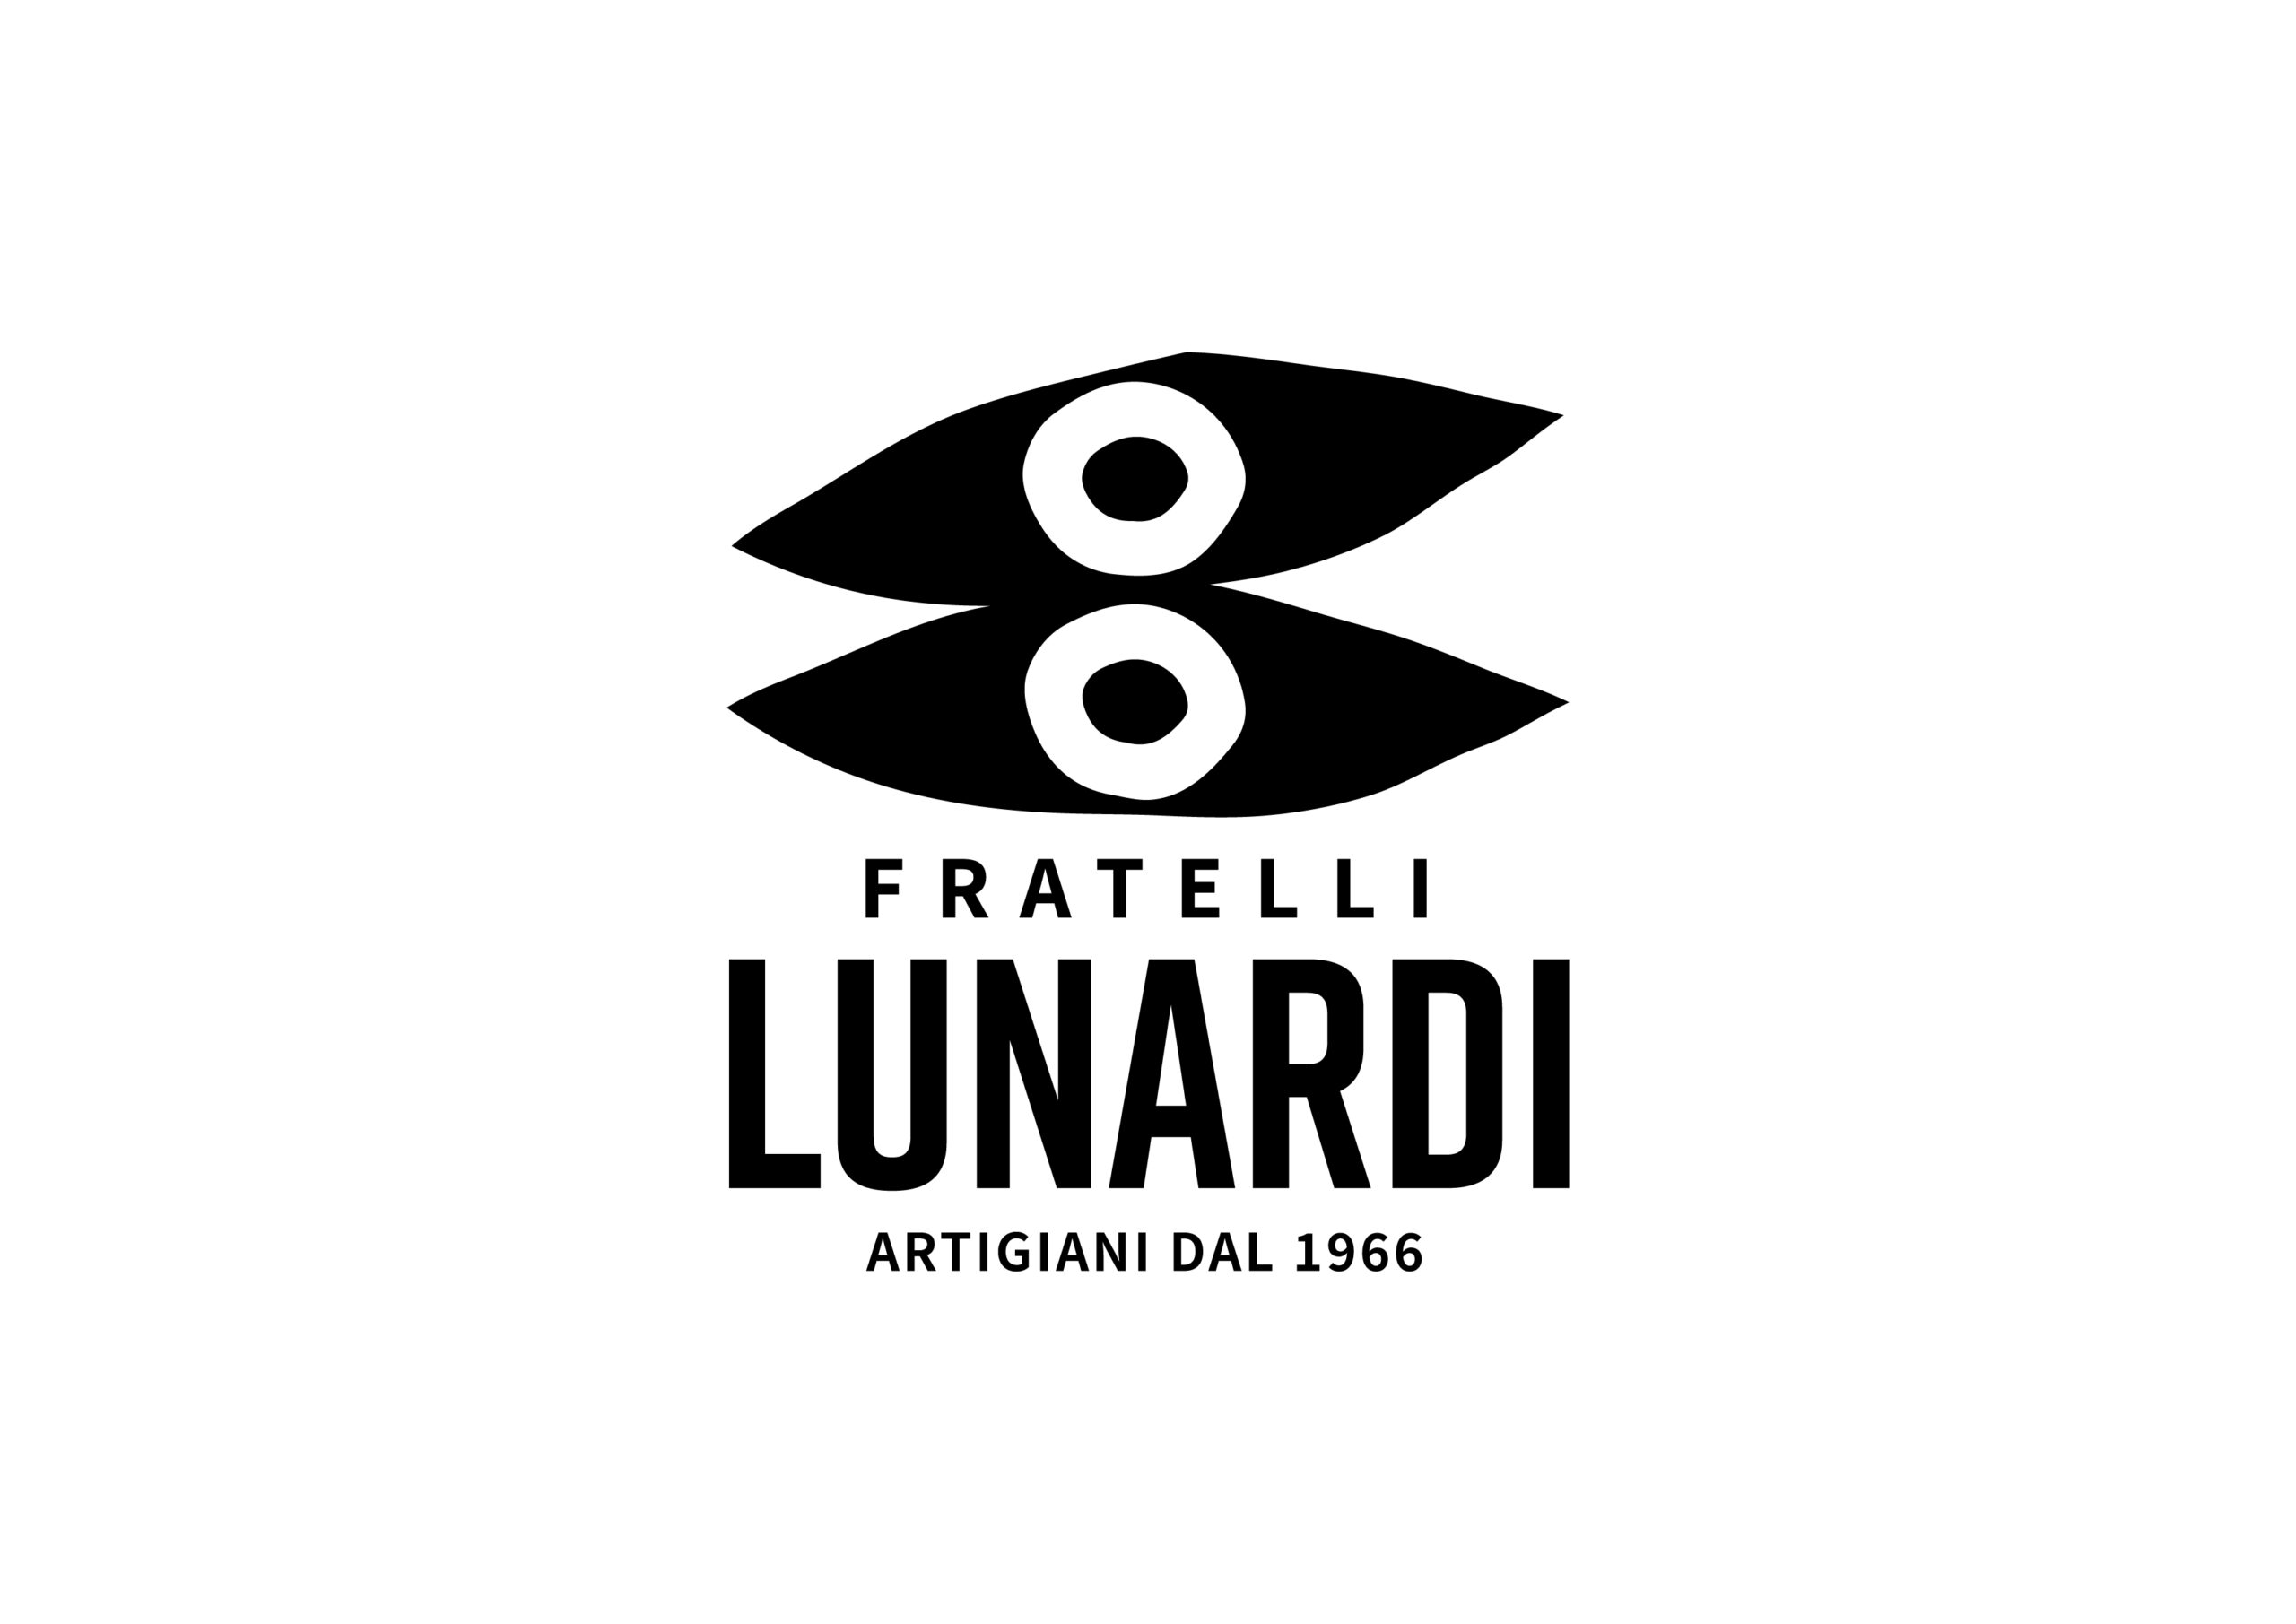 lunardi_logo_verticale_black